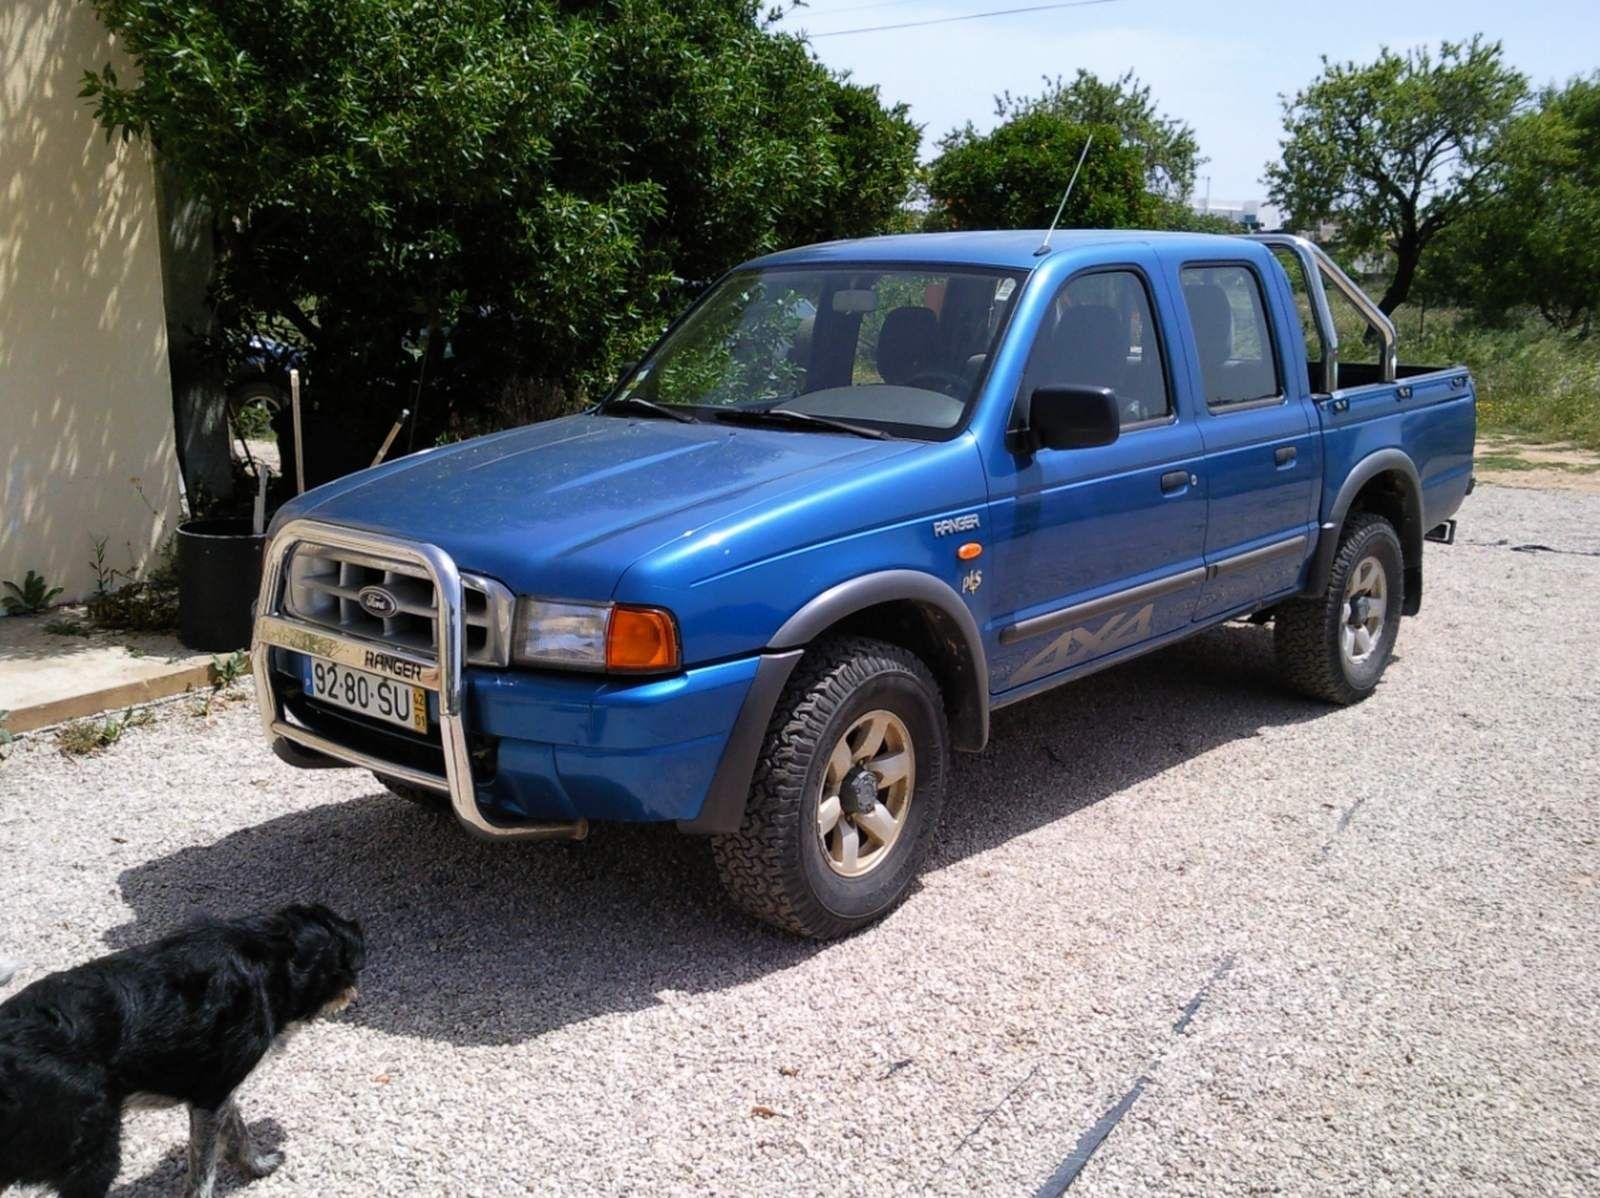 2002 ford ranger kelley blue book price 4 600